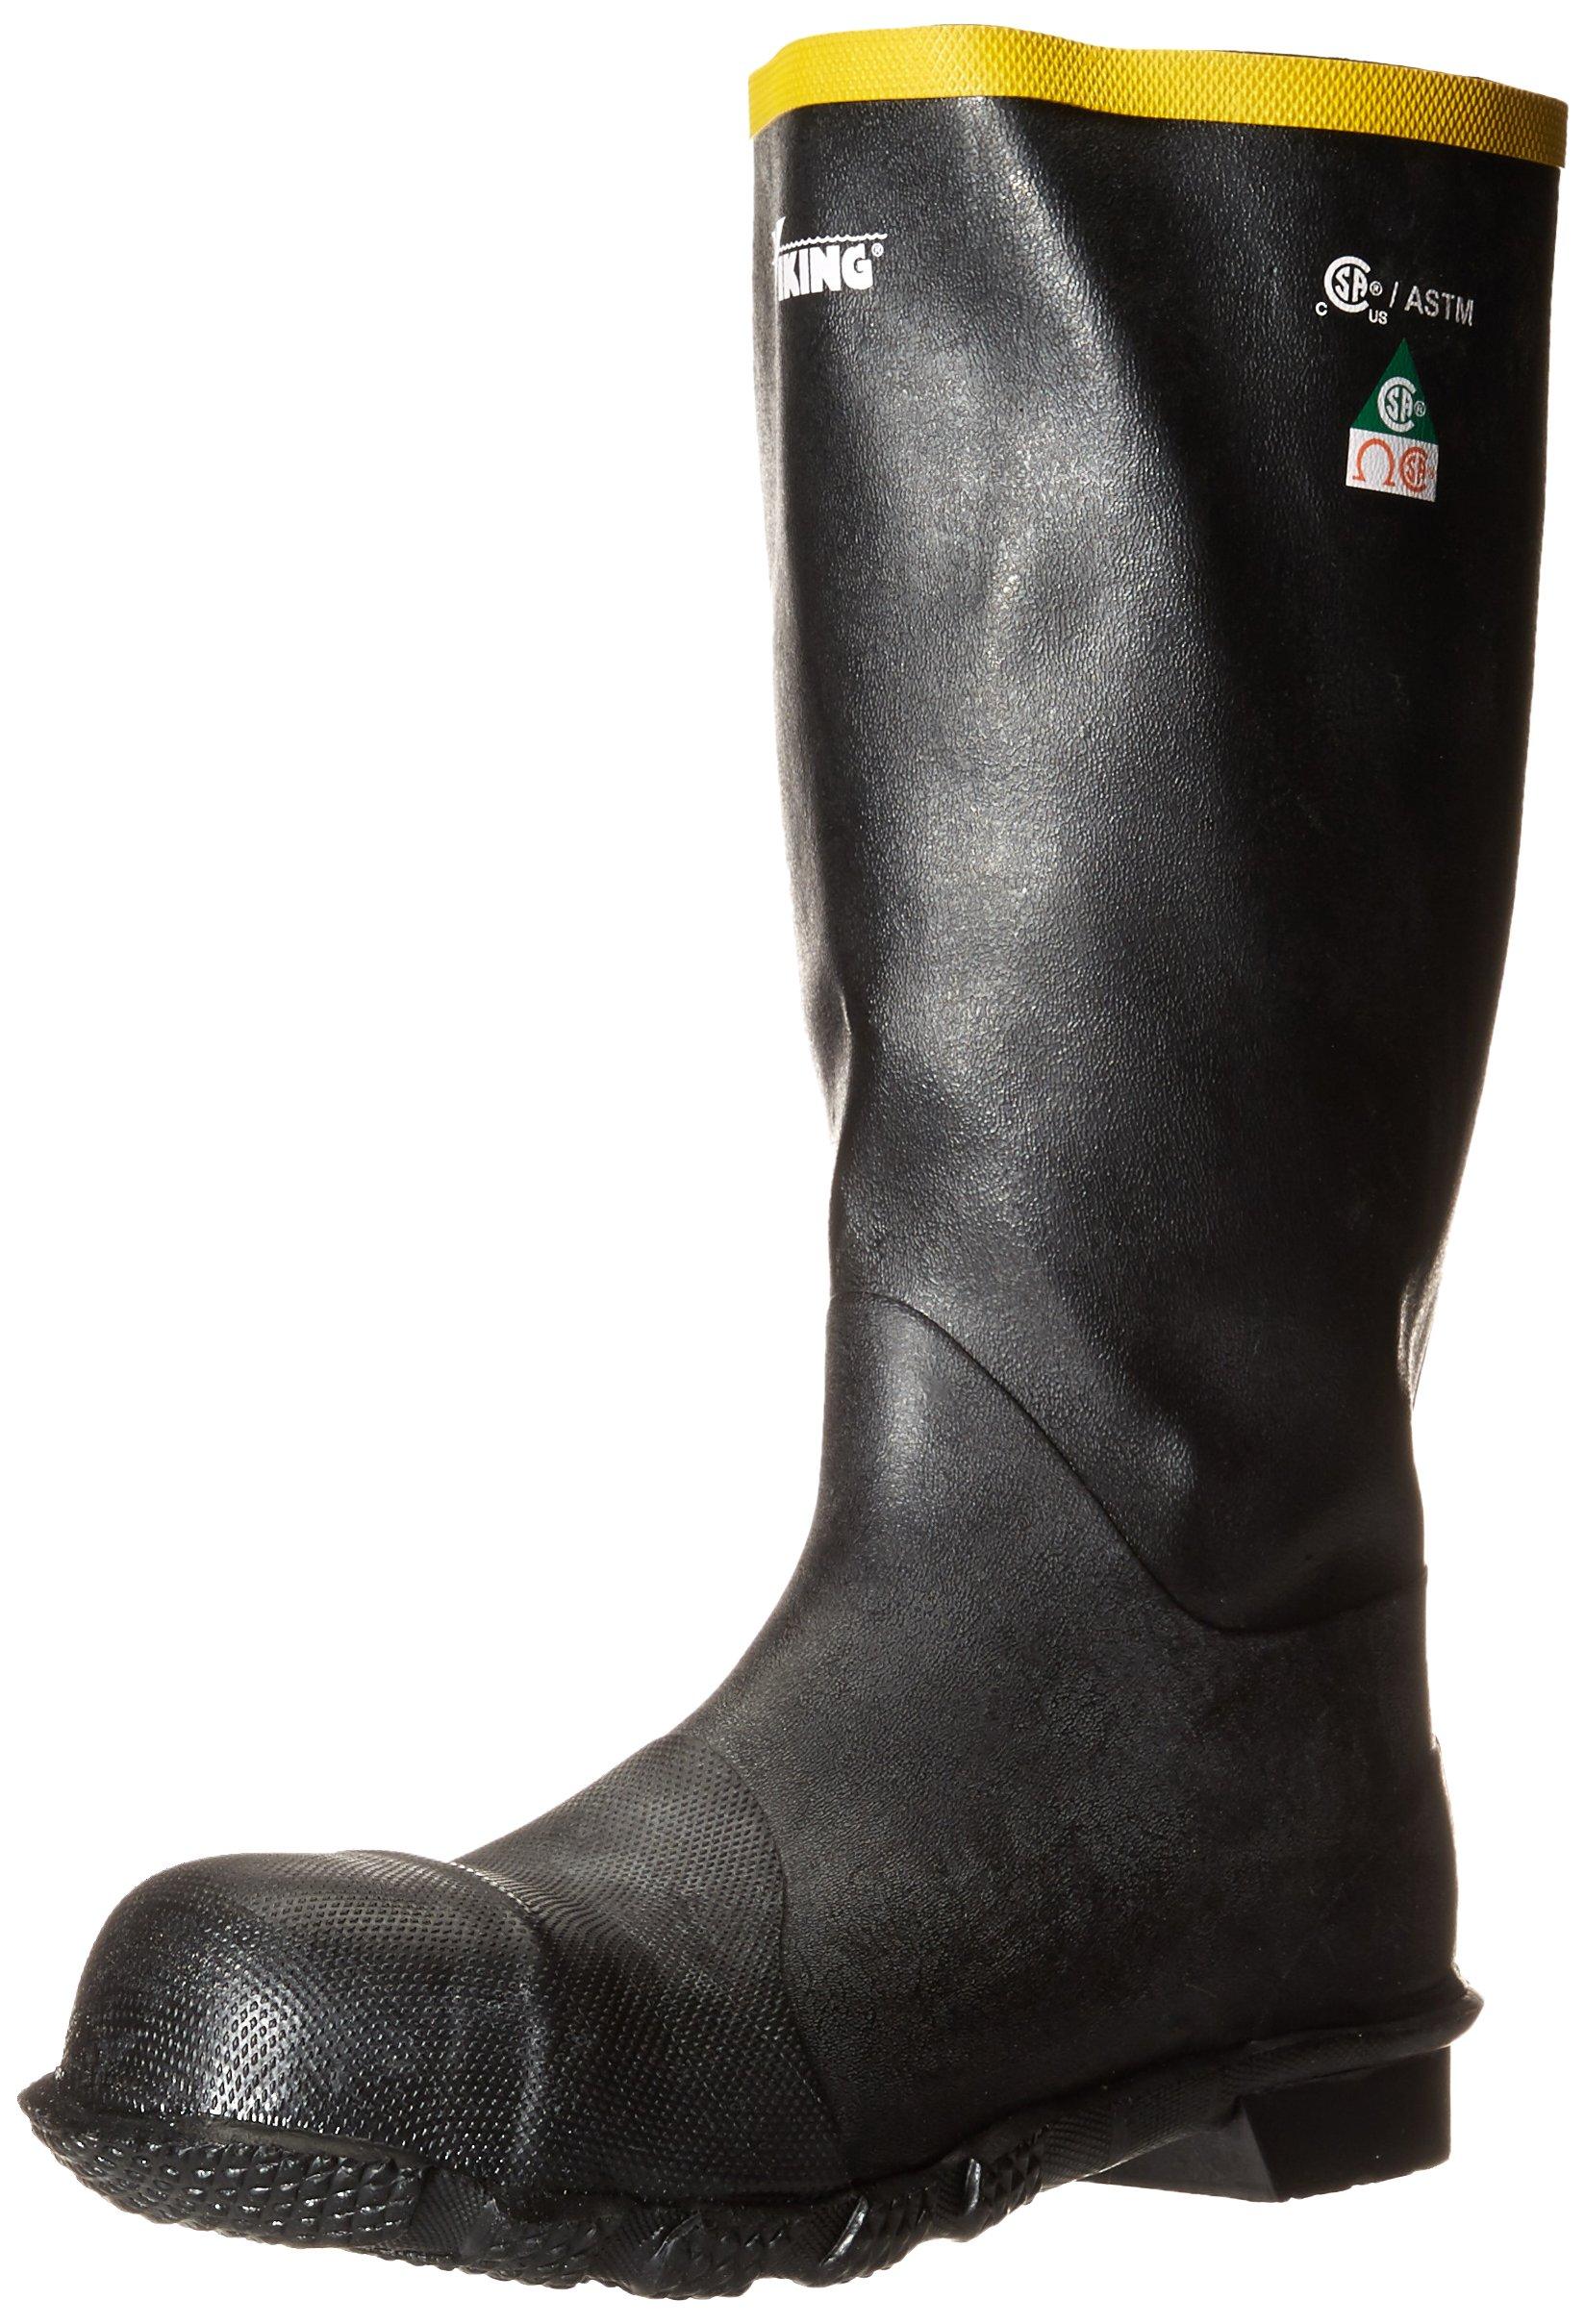 Viking Footwear Handyman Steel Toe Rubber Waterproof Boot, Black, 11 M US by Viking Footwear